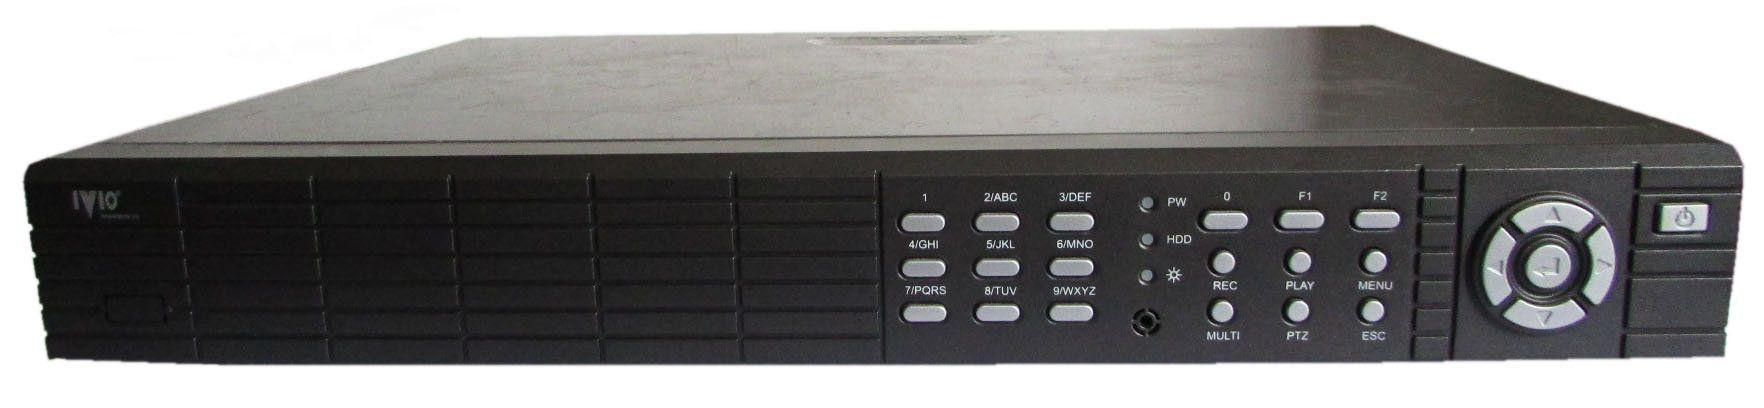 DVR Ivio H.264 Iv-3016nh 16 canais (semi novo)